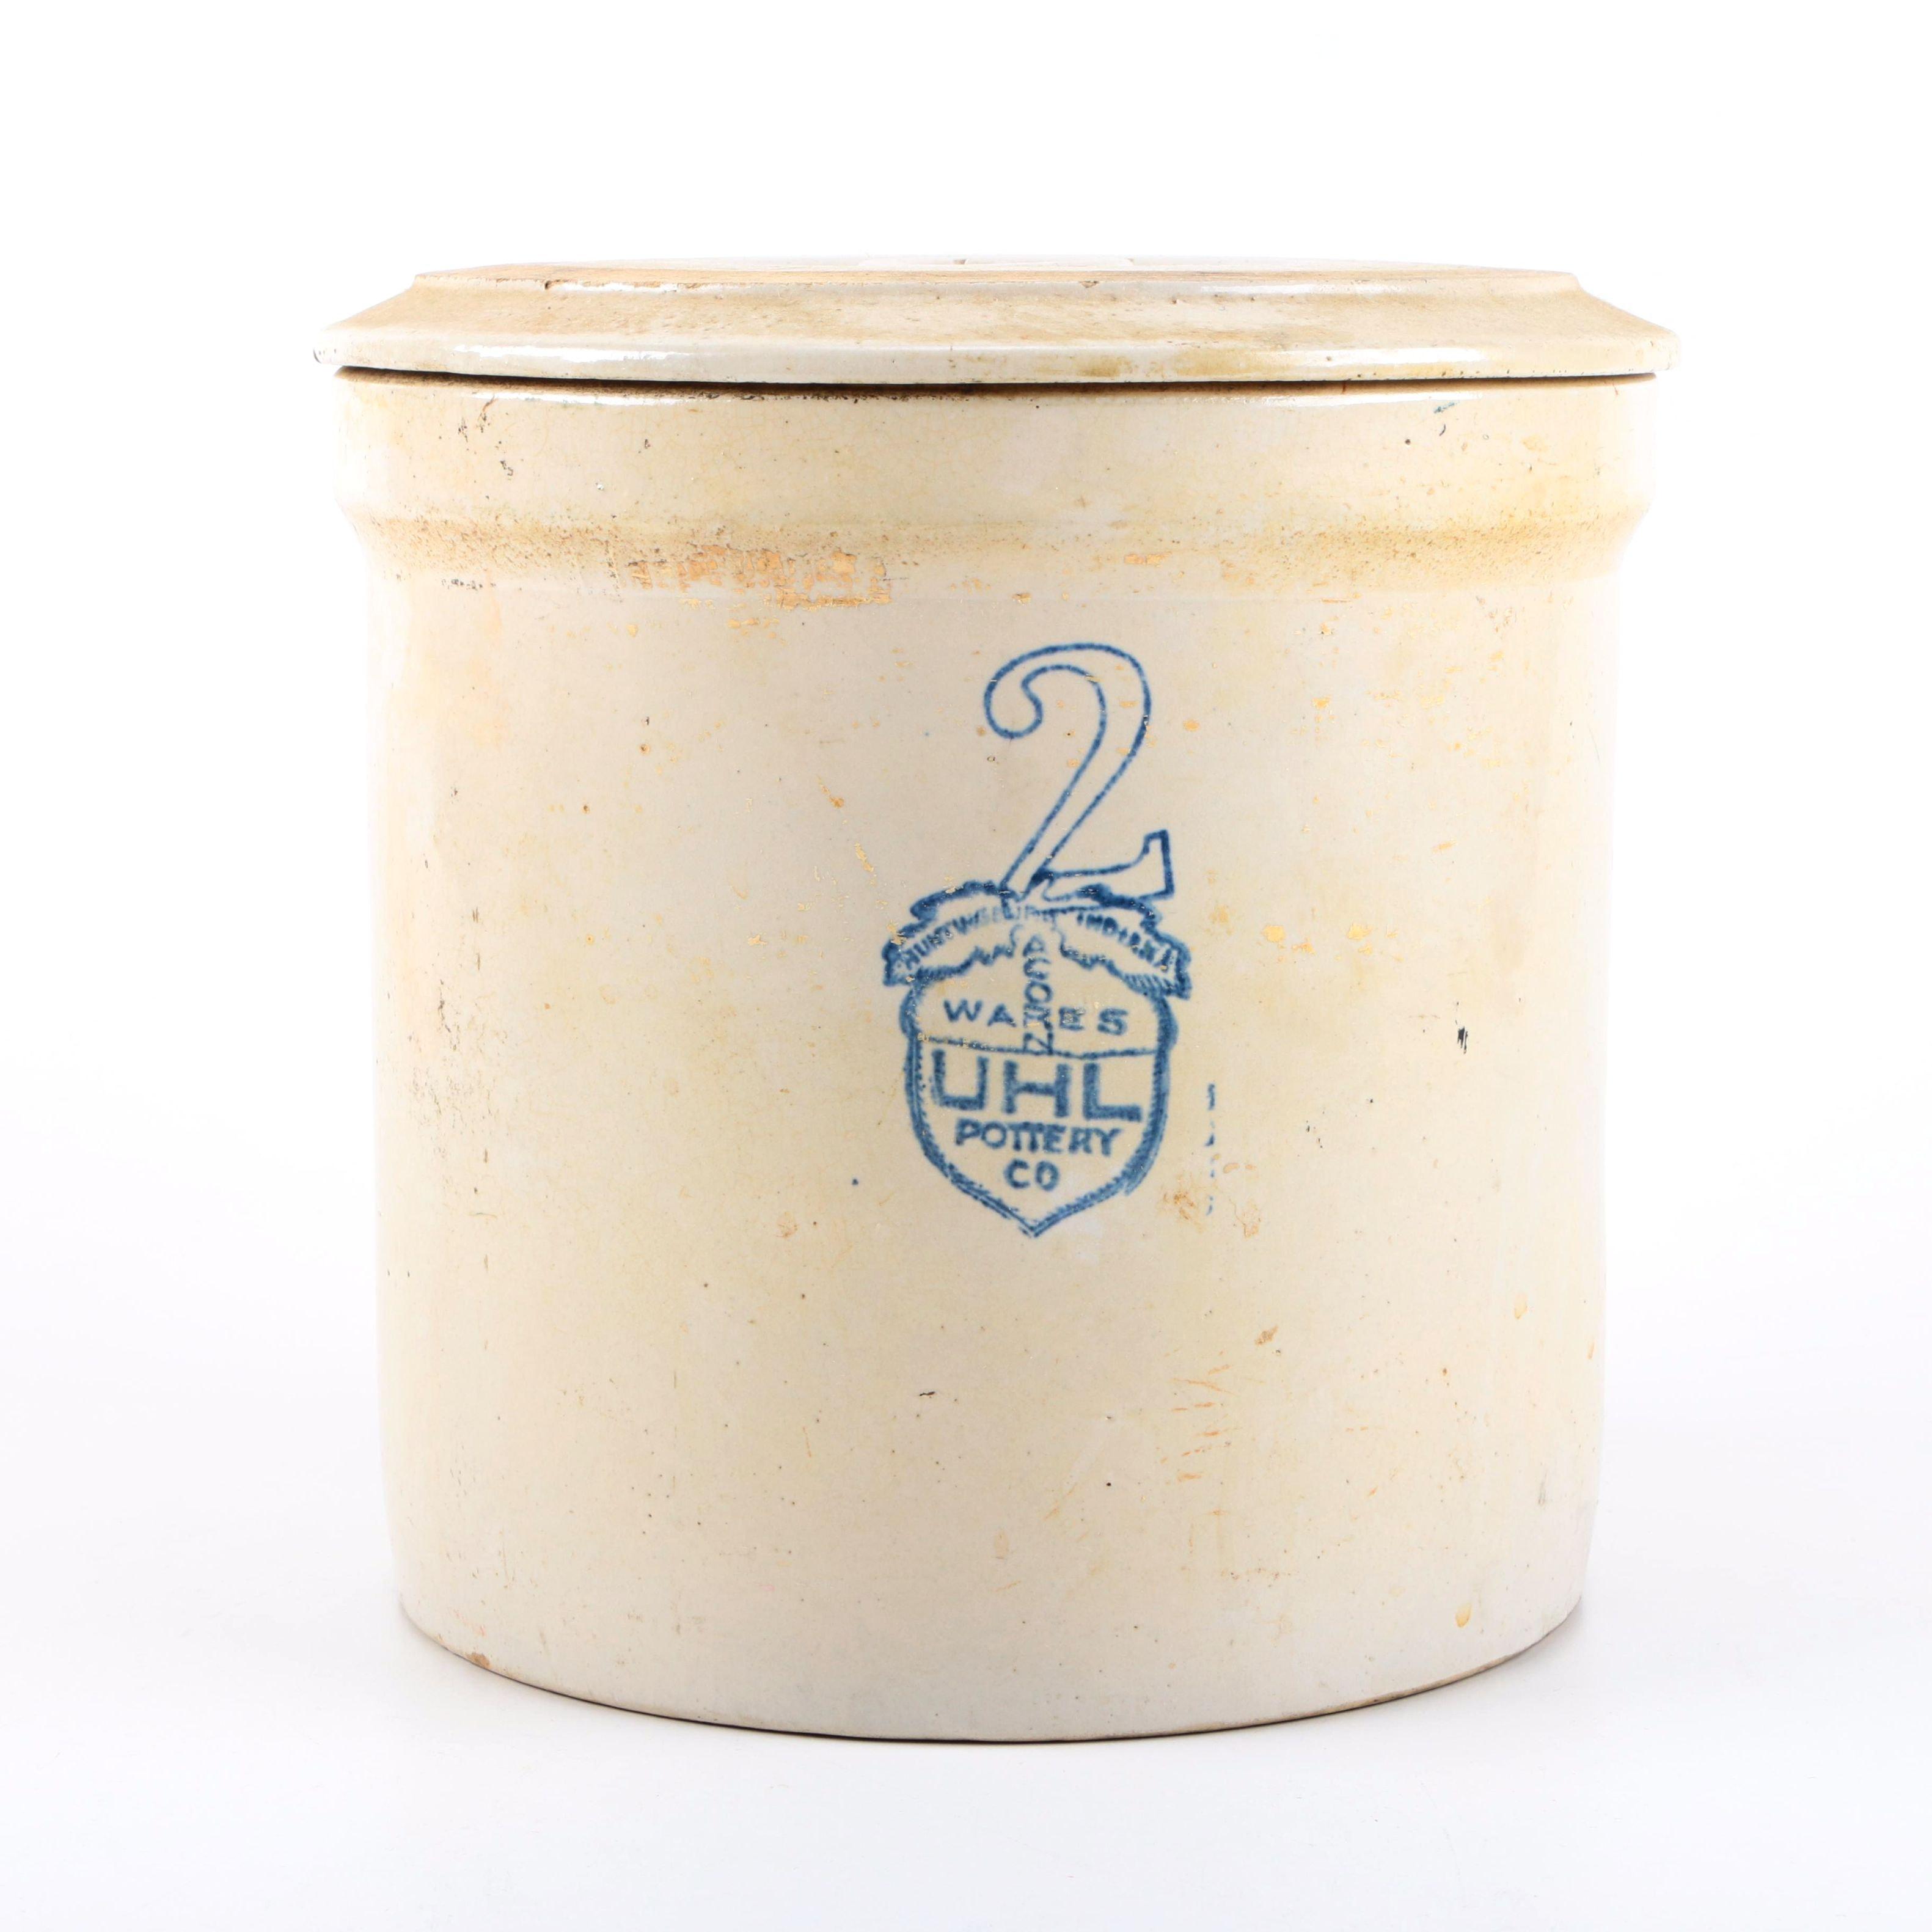 "UHL Pottery Co. ""Acorn Wares"" Stoneware Covered Crock"